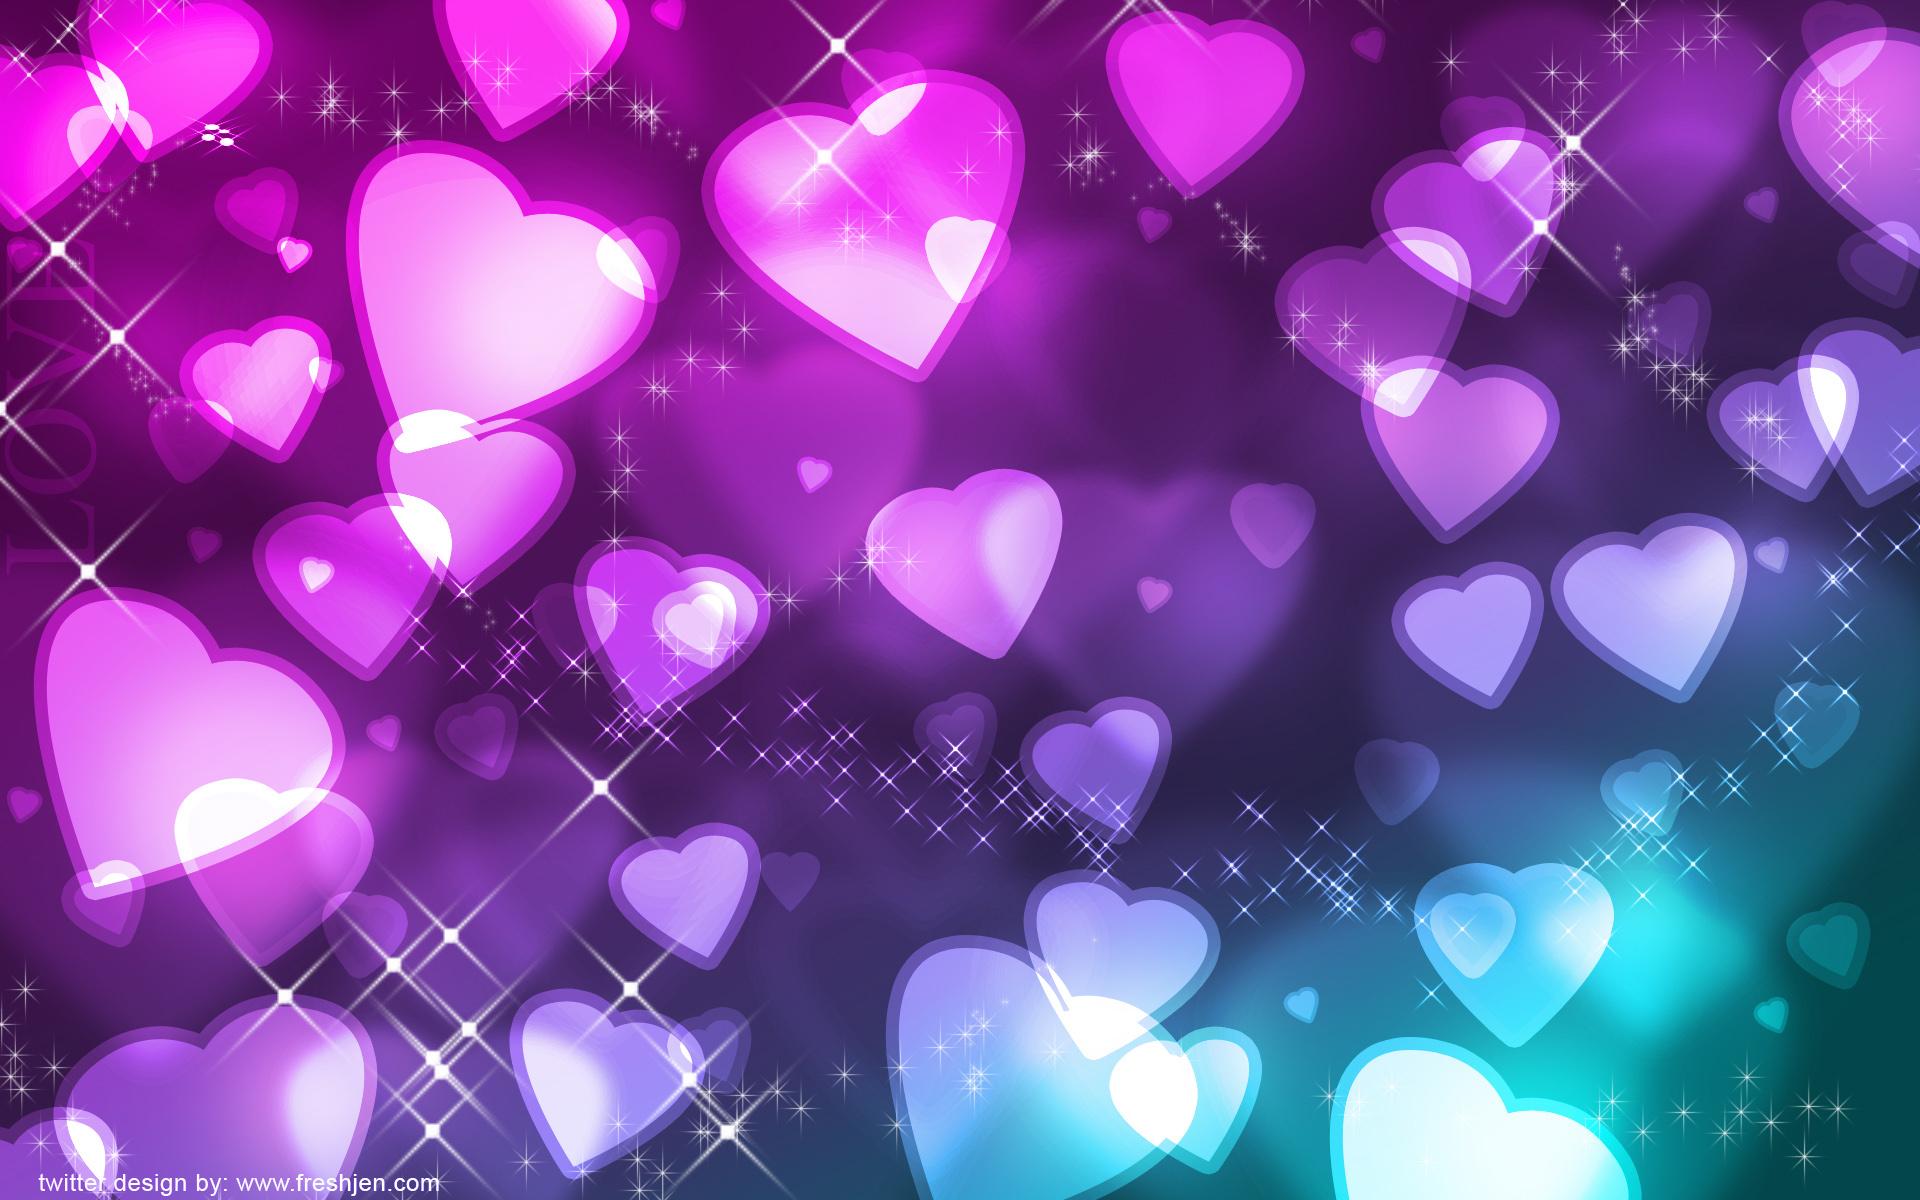 Background Backgrounds Heart Hearts Freshjen wallpapers HD 1920x1200